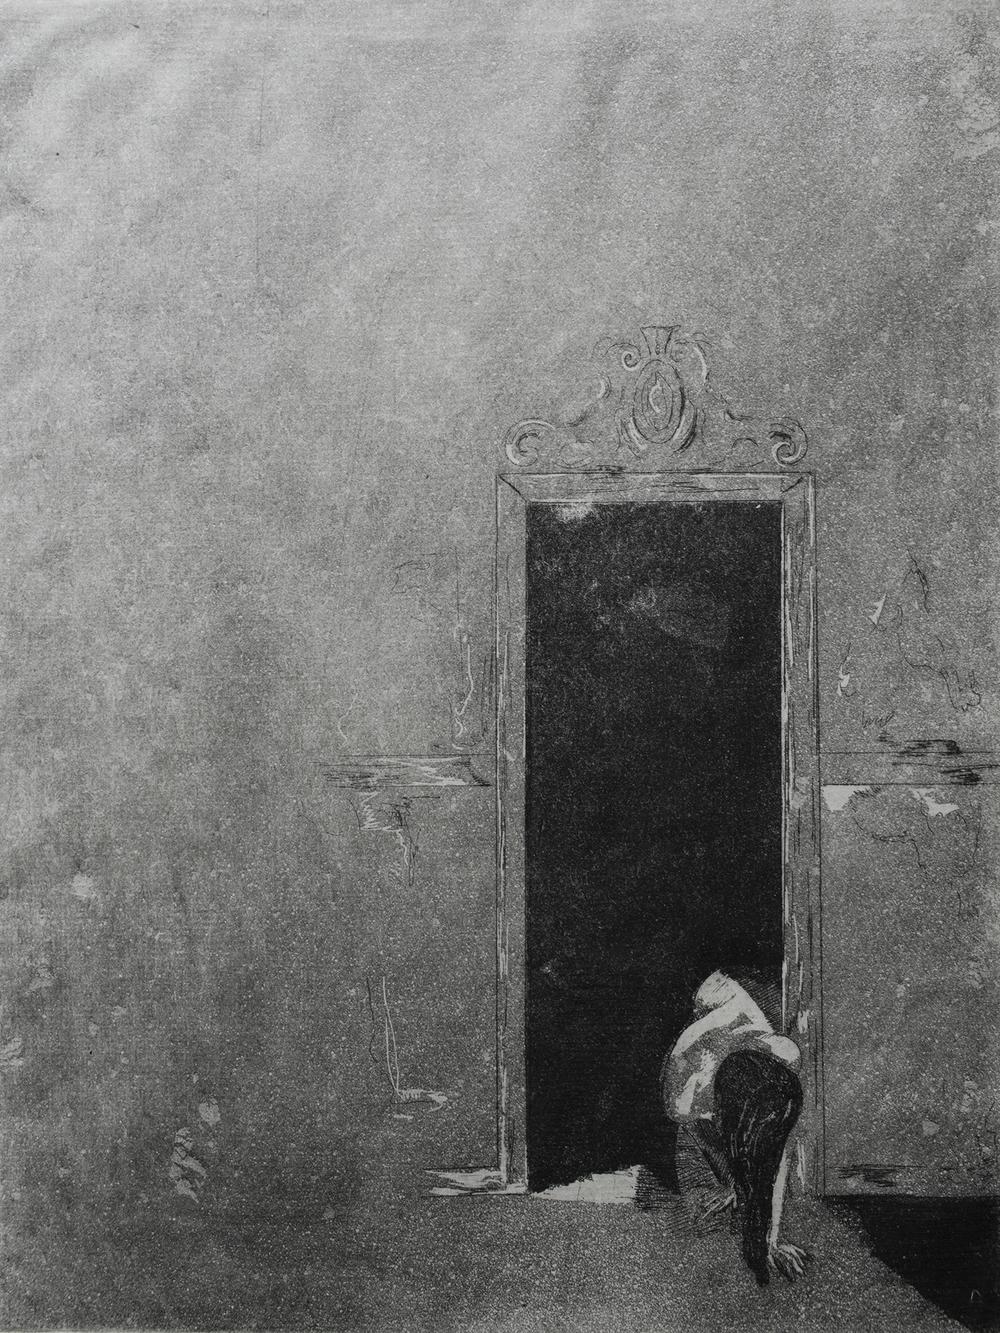 Hide and Seek,  2015, etching and aqua tint on Kitakata paper, 9x12''